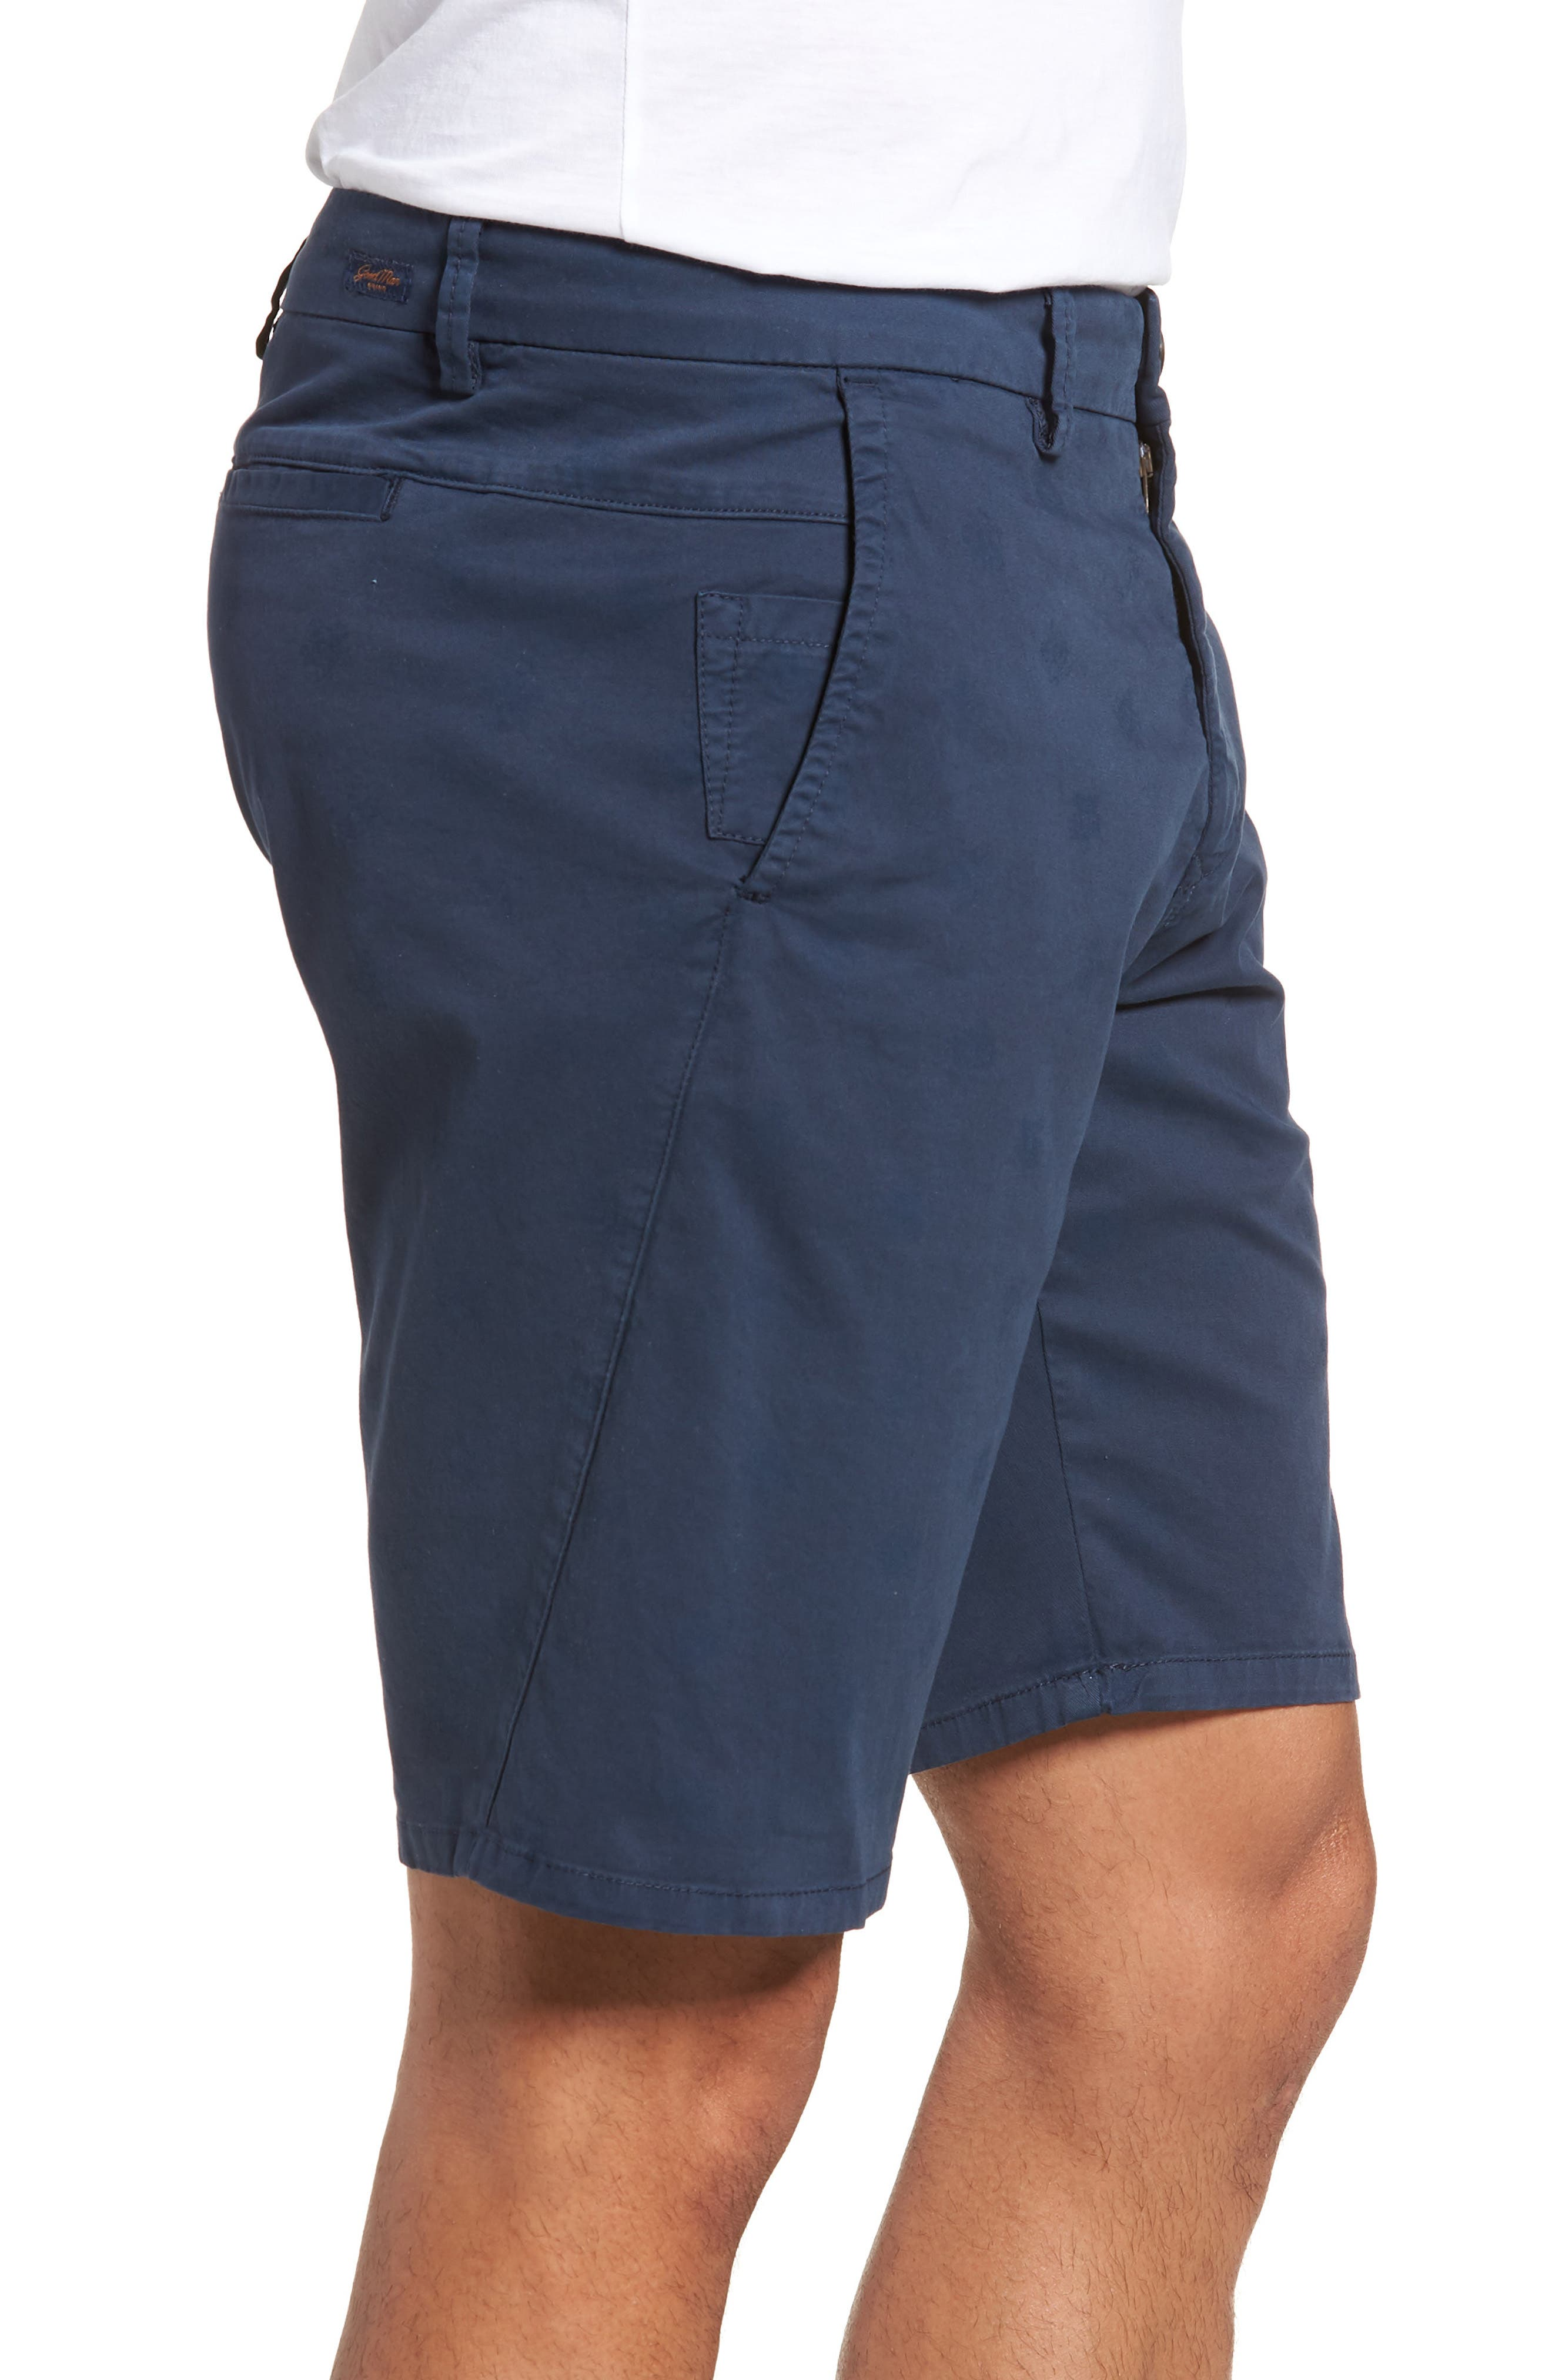 Monaco Floral Stretch Shorts,                             Alternate thumbnail 3, color,                             Indigo